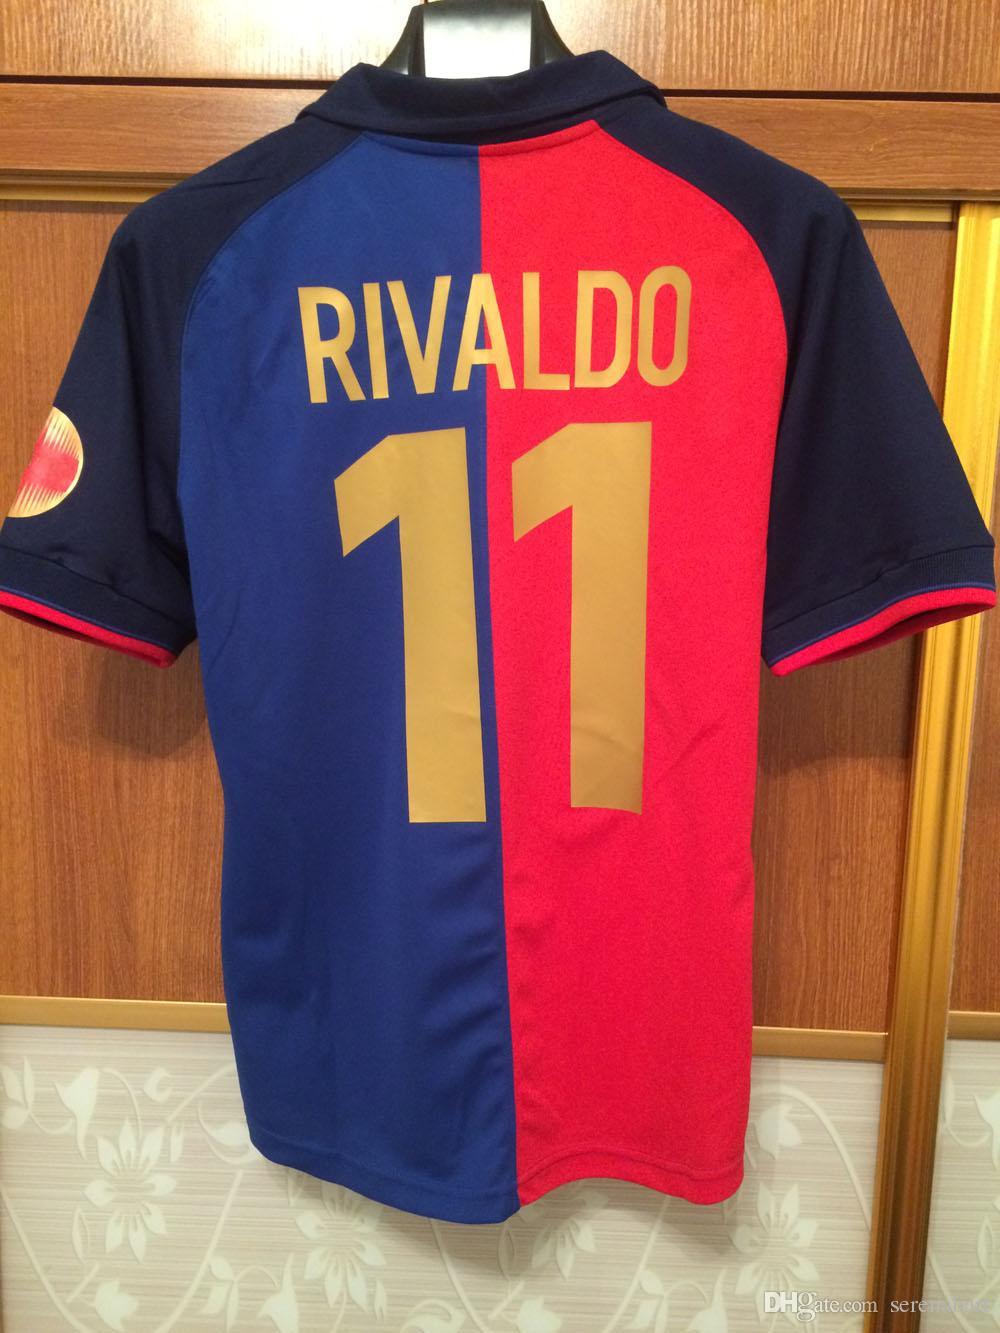 45104006bf4 2019 1998 1999 Centennial Edition Vintage Jerseys Retro Jersey Rivaldo  Litmanen Enrique Guardiola Kluivert Retor Classic Shirts From Serenabart